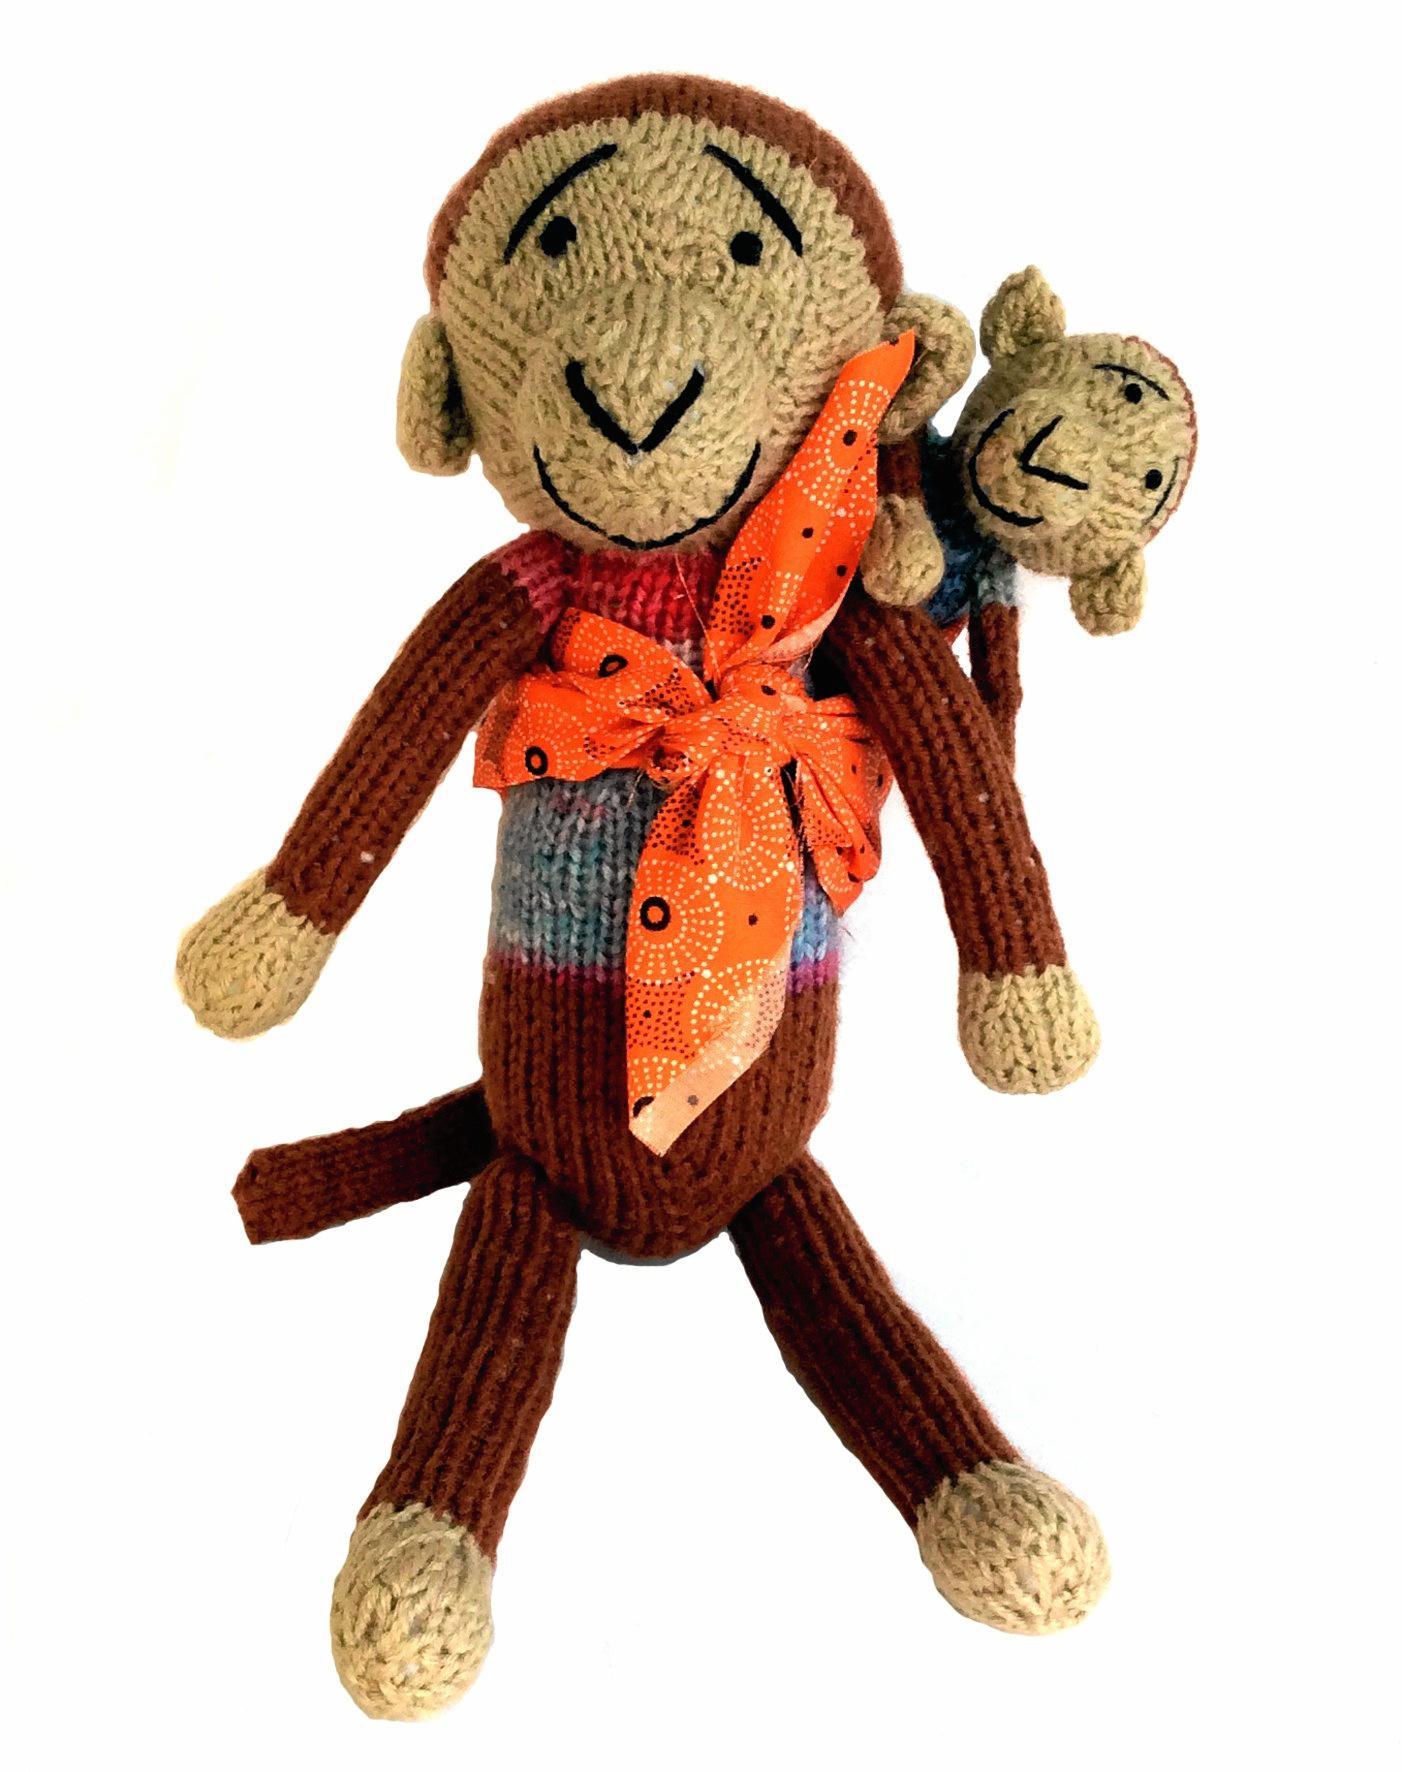 A knitted GoGo teddy from Ciommunity Projects Worldwide.